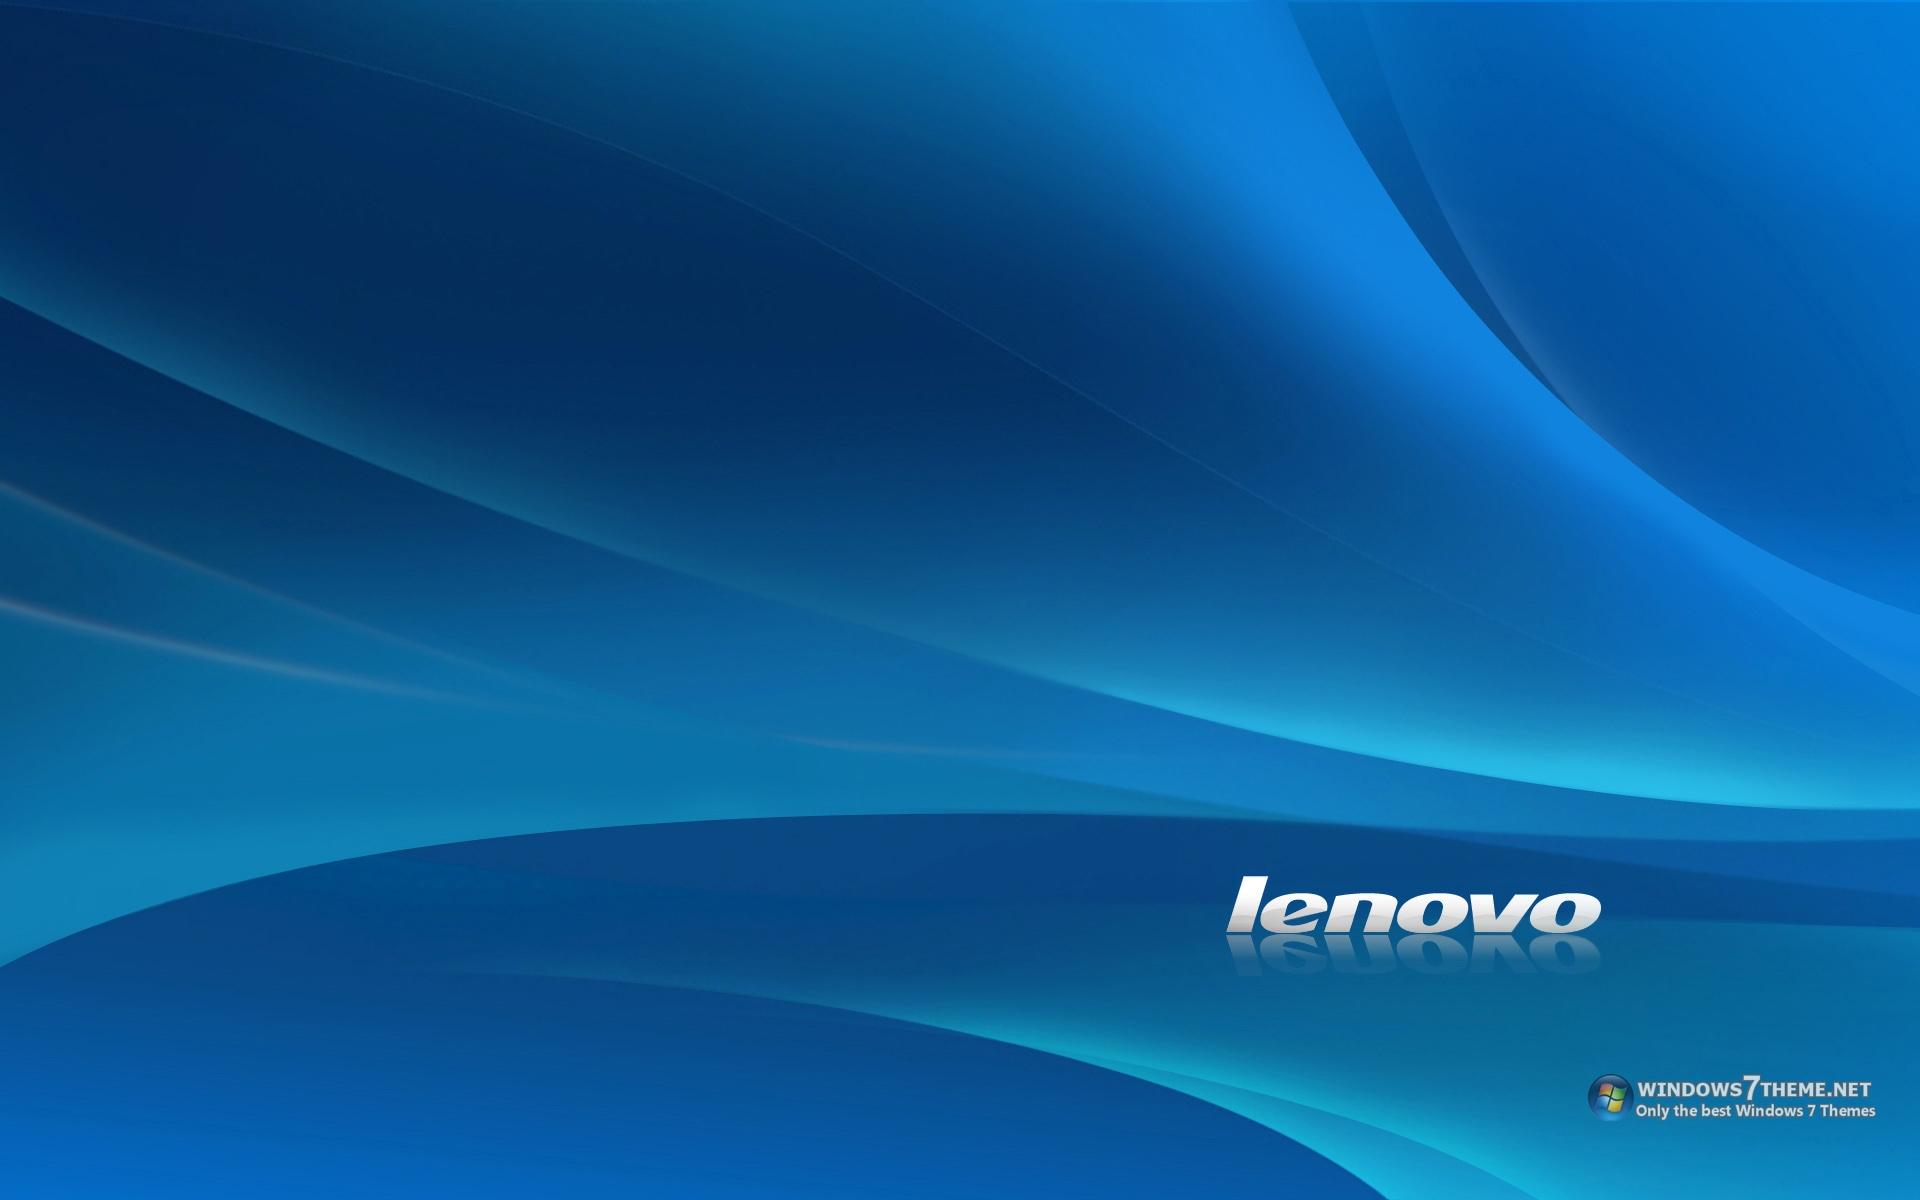 Wallpaper Lenovo Windows 8 MEJOR CONJUNTO DE FRASES 1920x1200